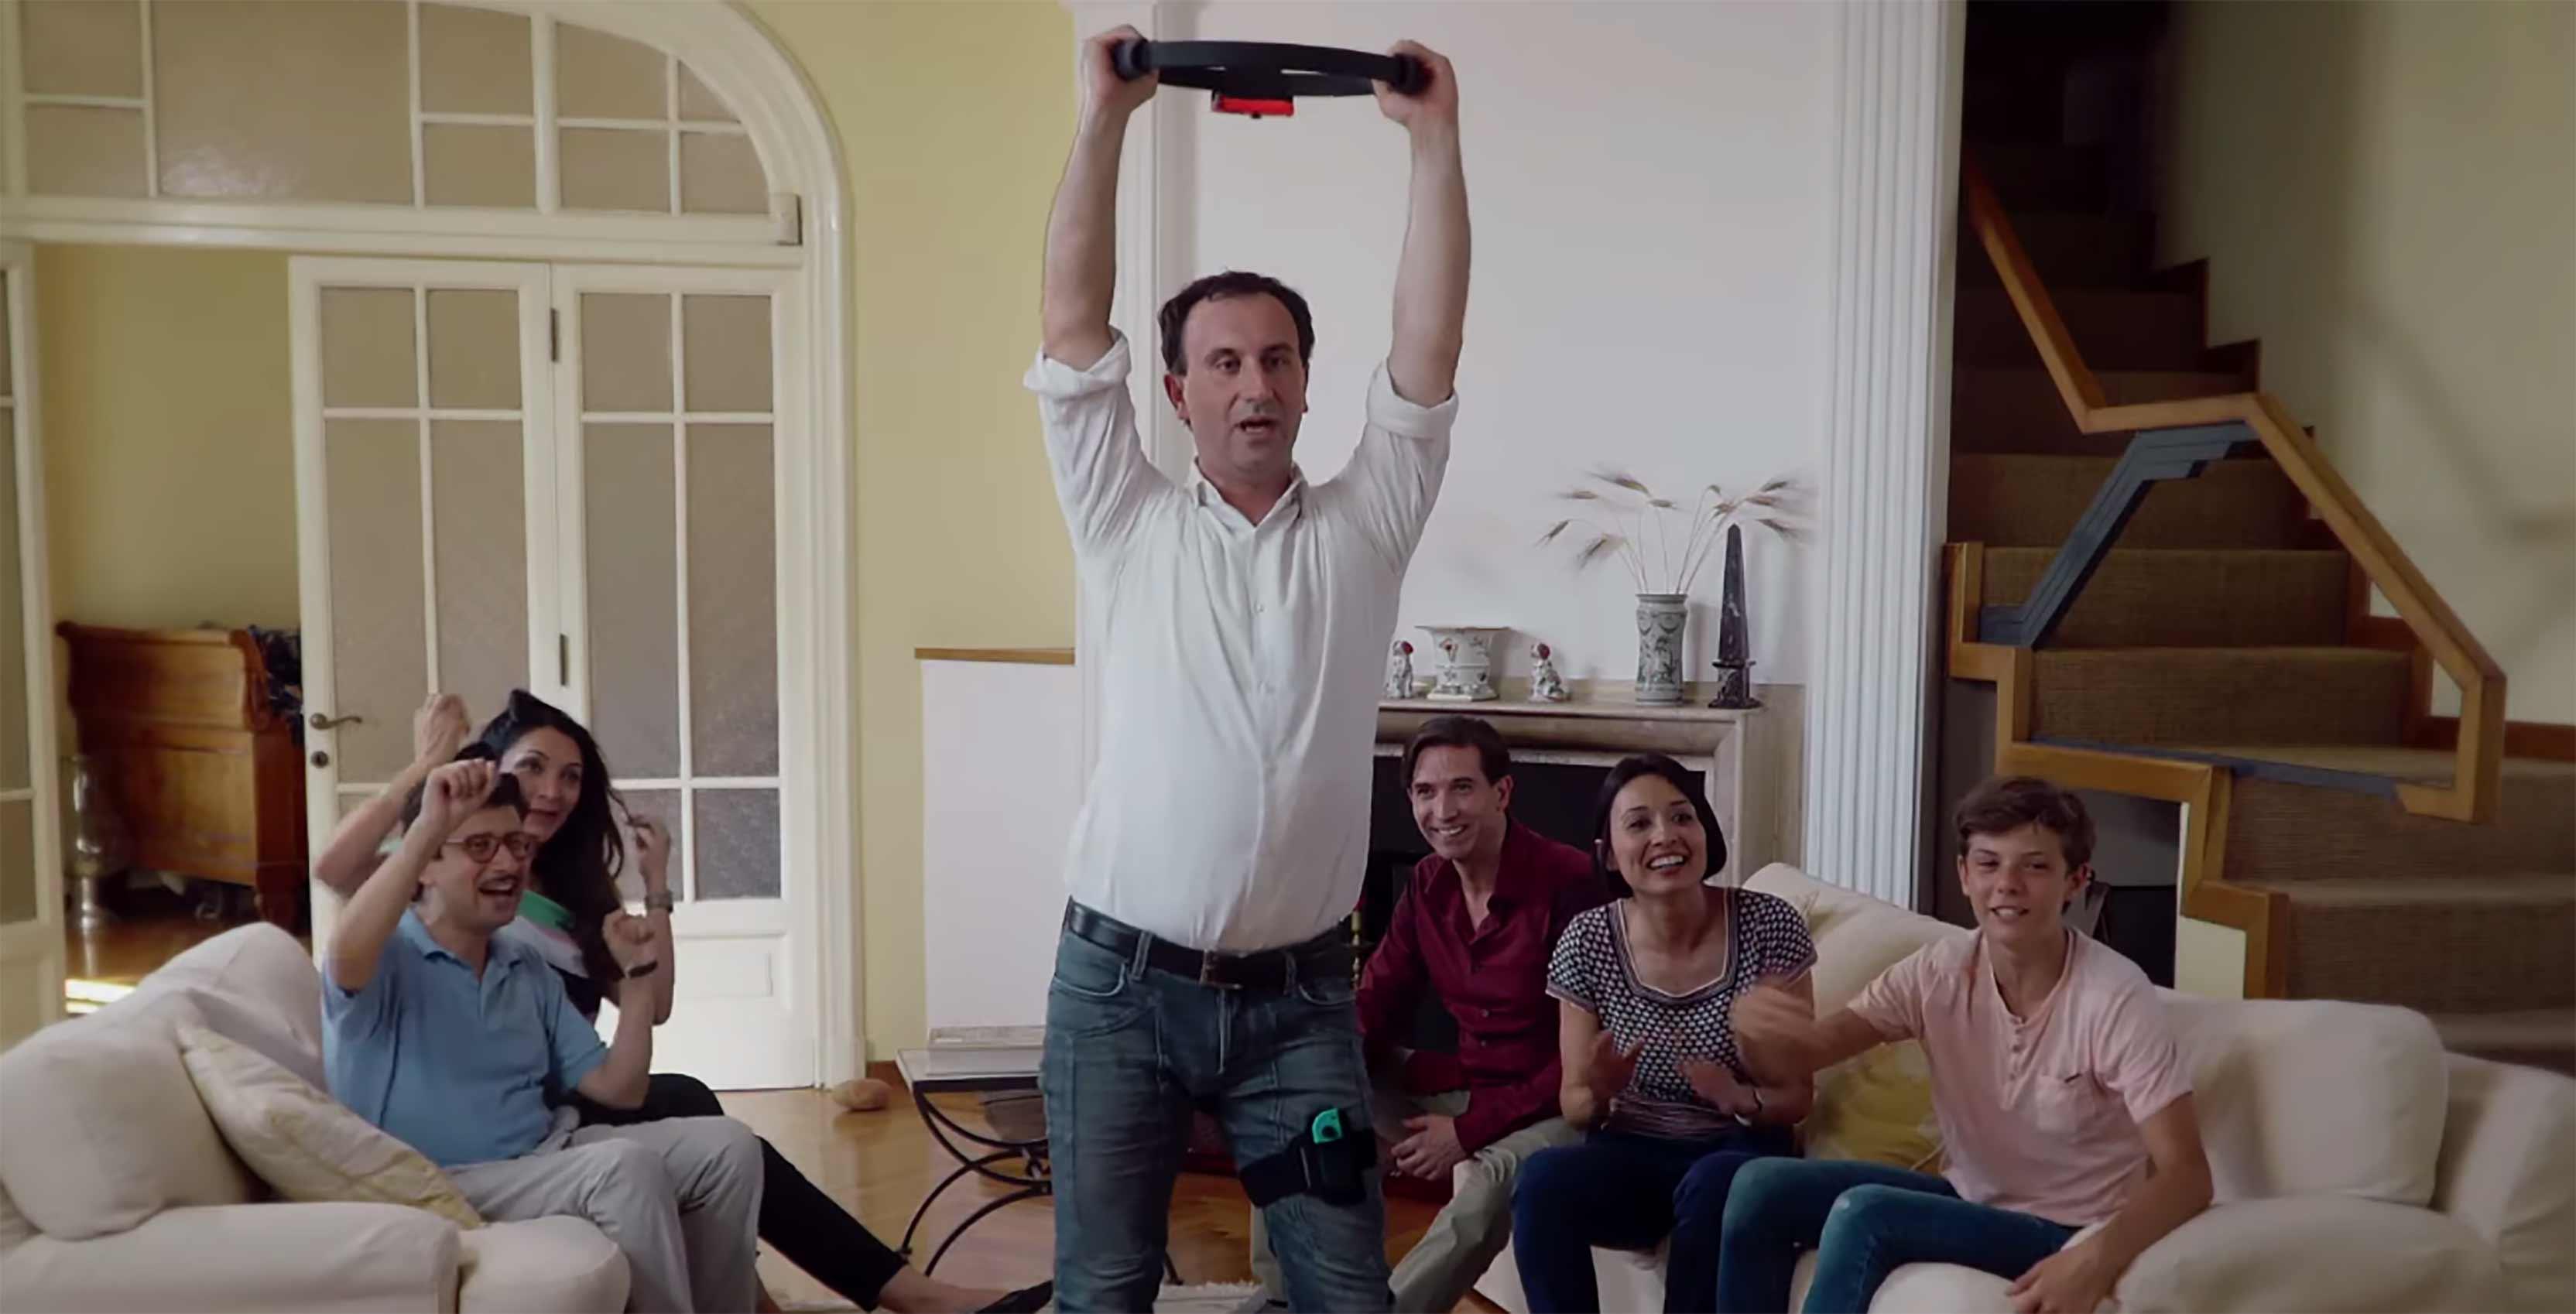 Nintendo Switch strange accessory